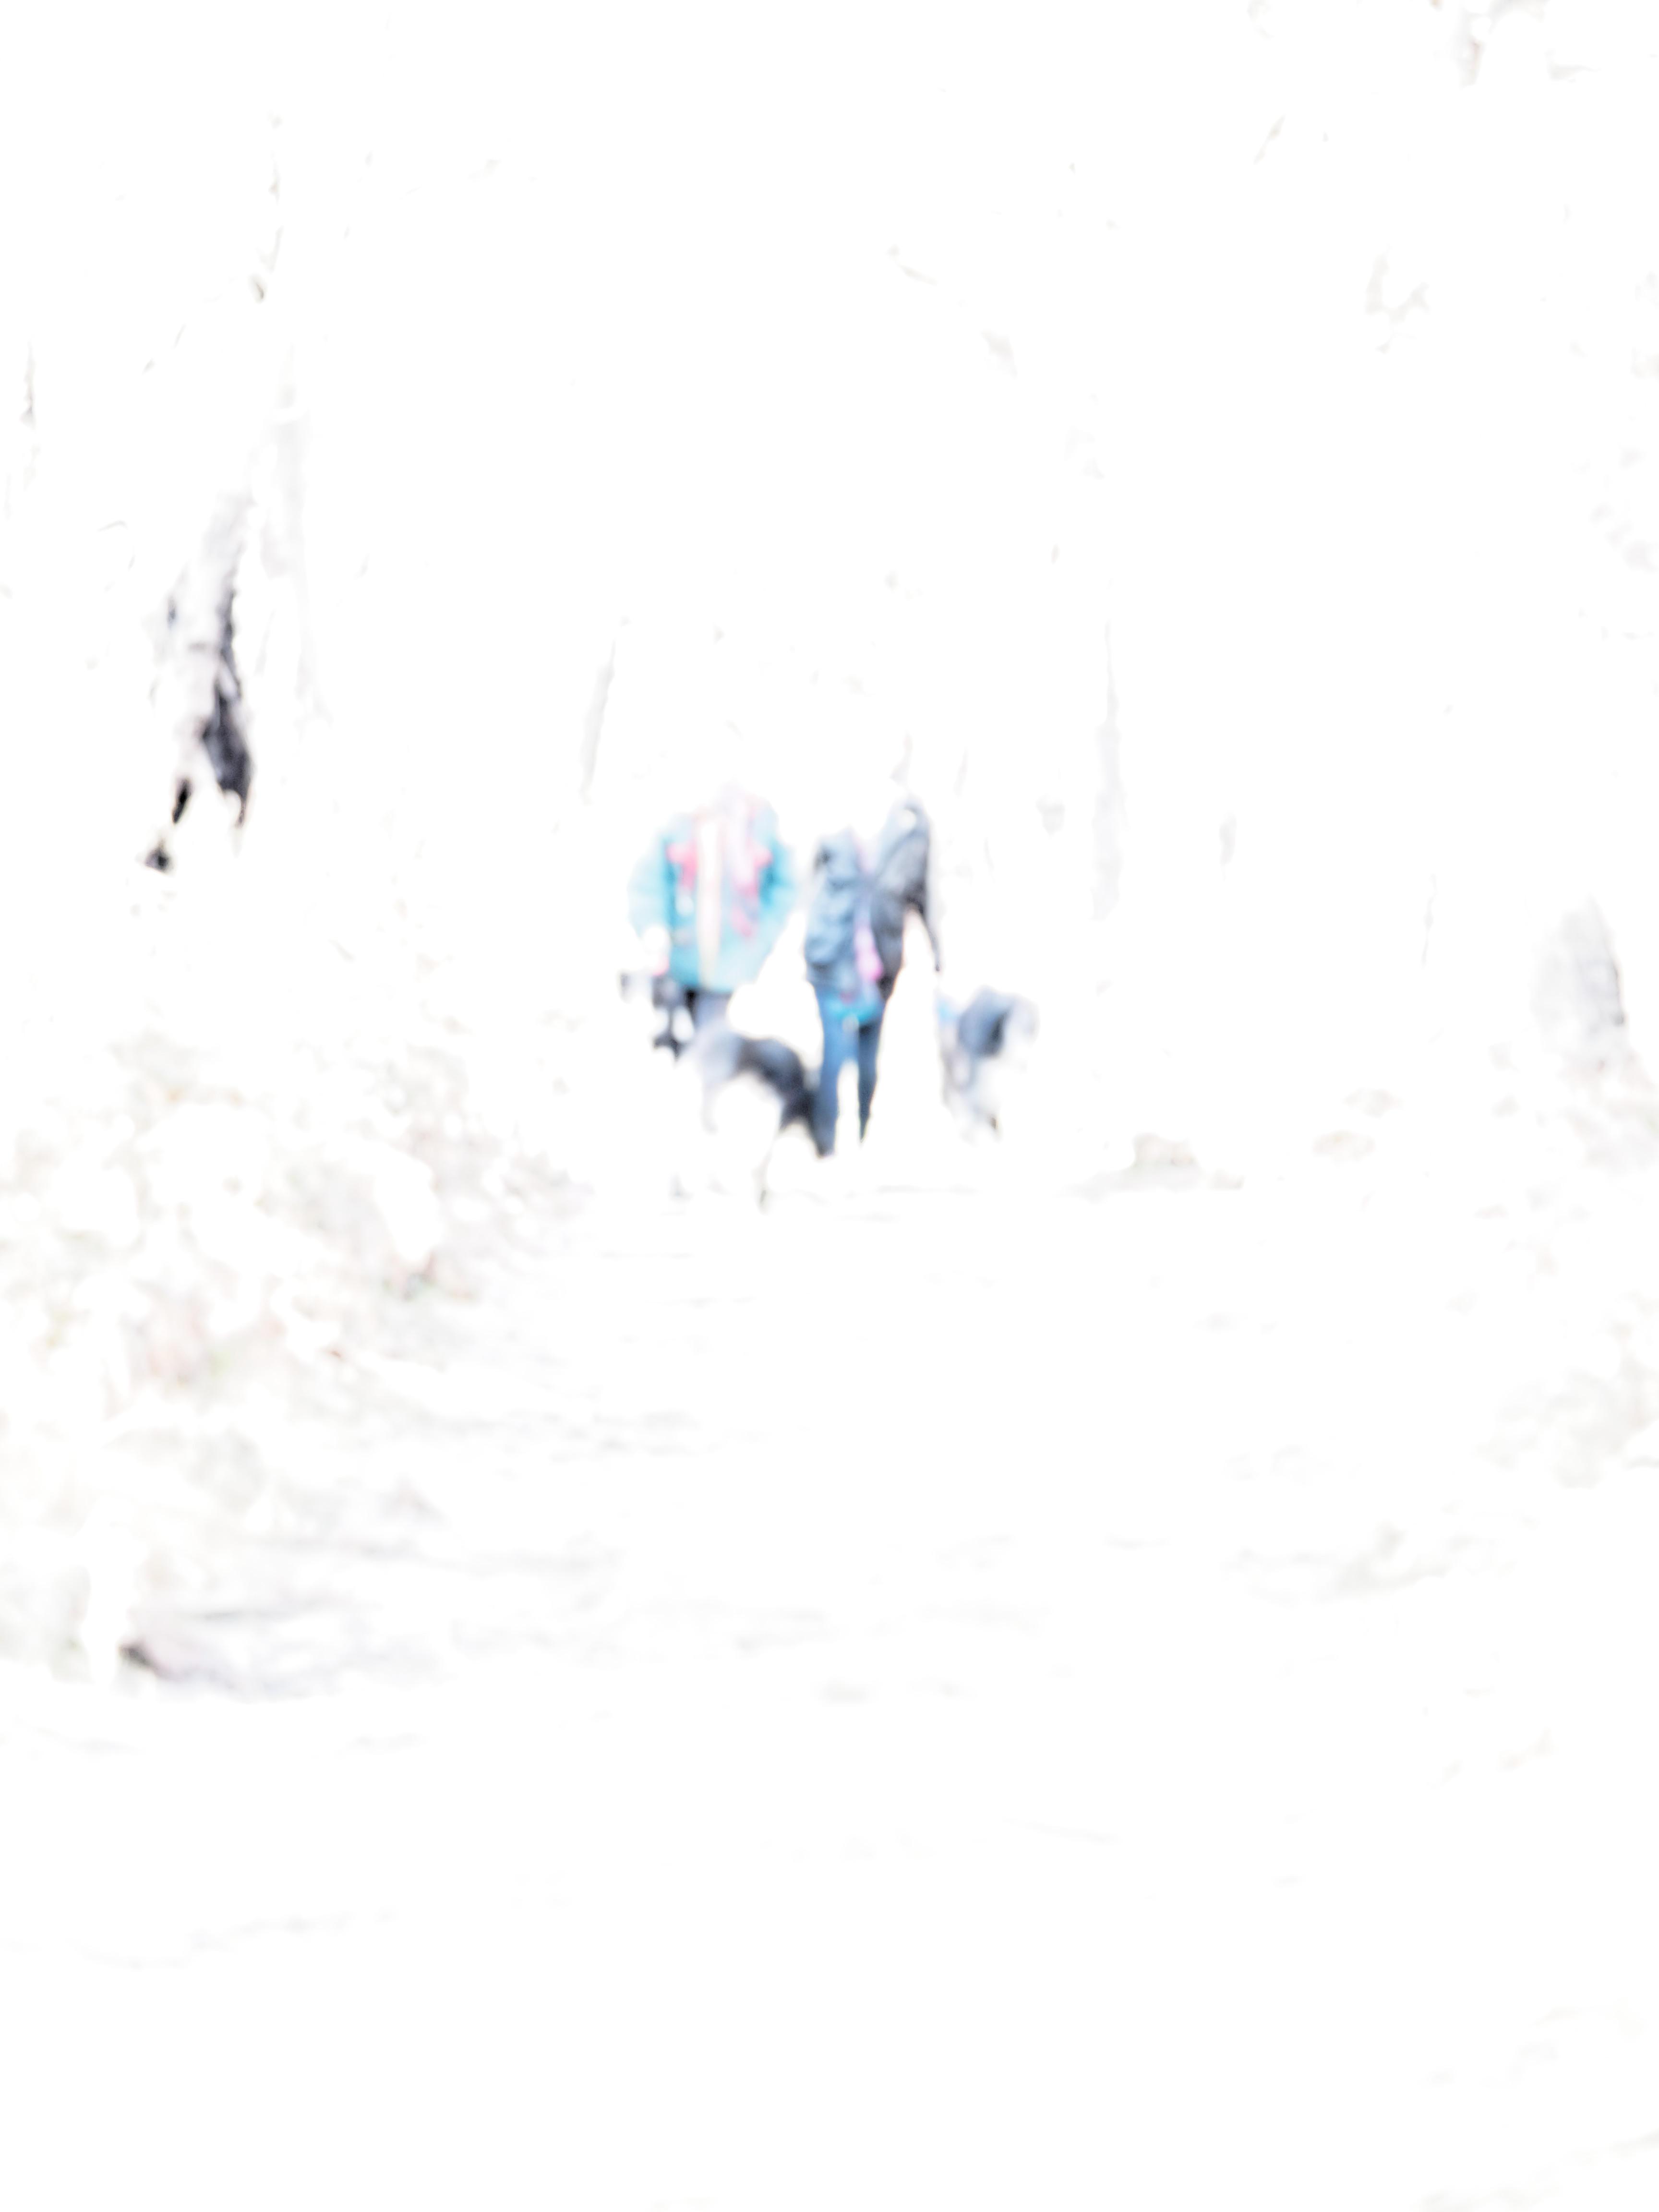 Walk-in-forest-2.jpeg